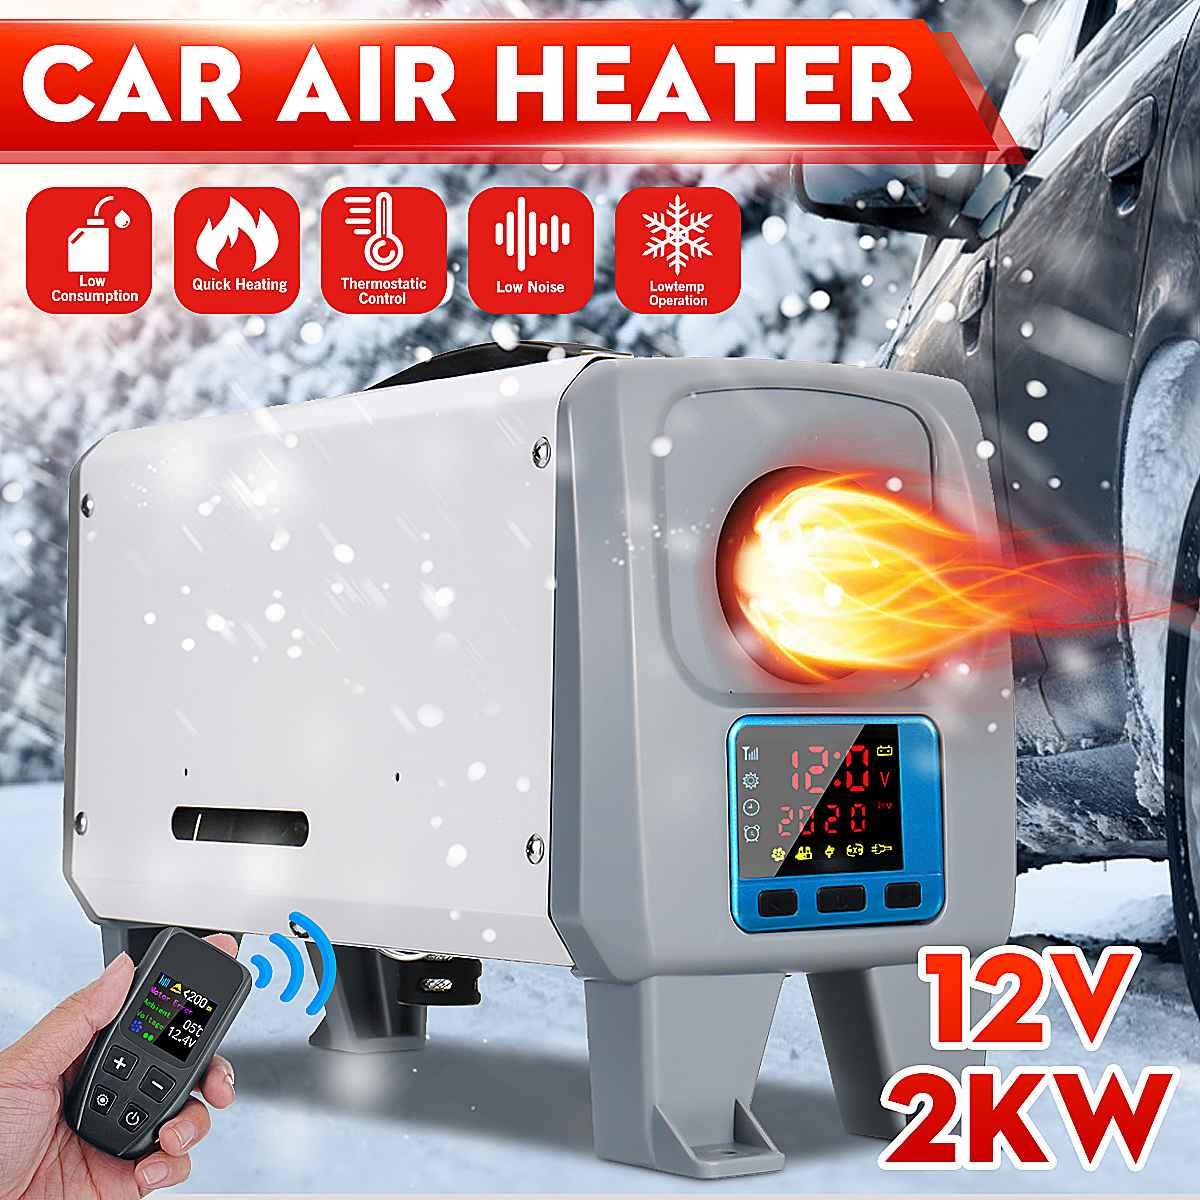 Calentador de coche 2KW 12 V, ventilador de calentador de aire diésel, nuevo interruptor negro LCD + máquina integrada de control remoto para furgoneta, barco, autobús RV